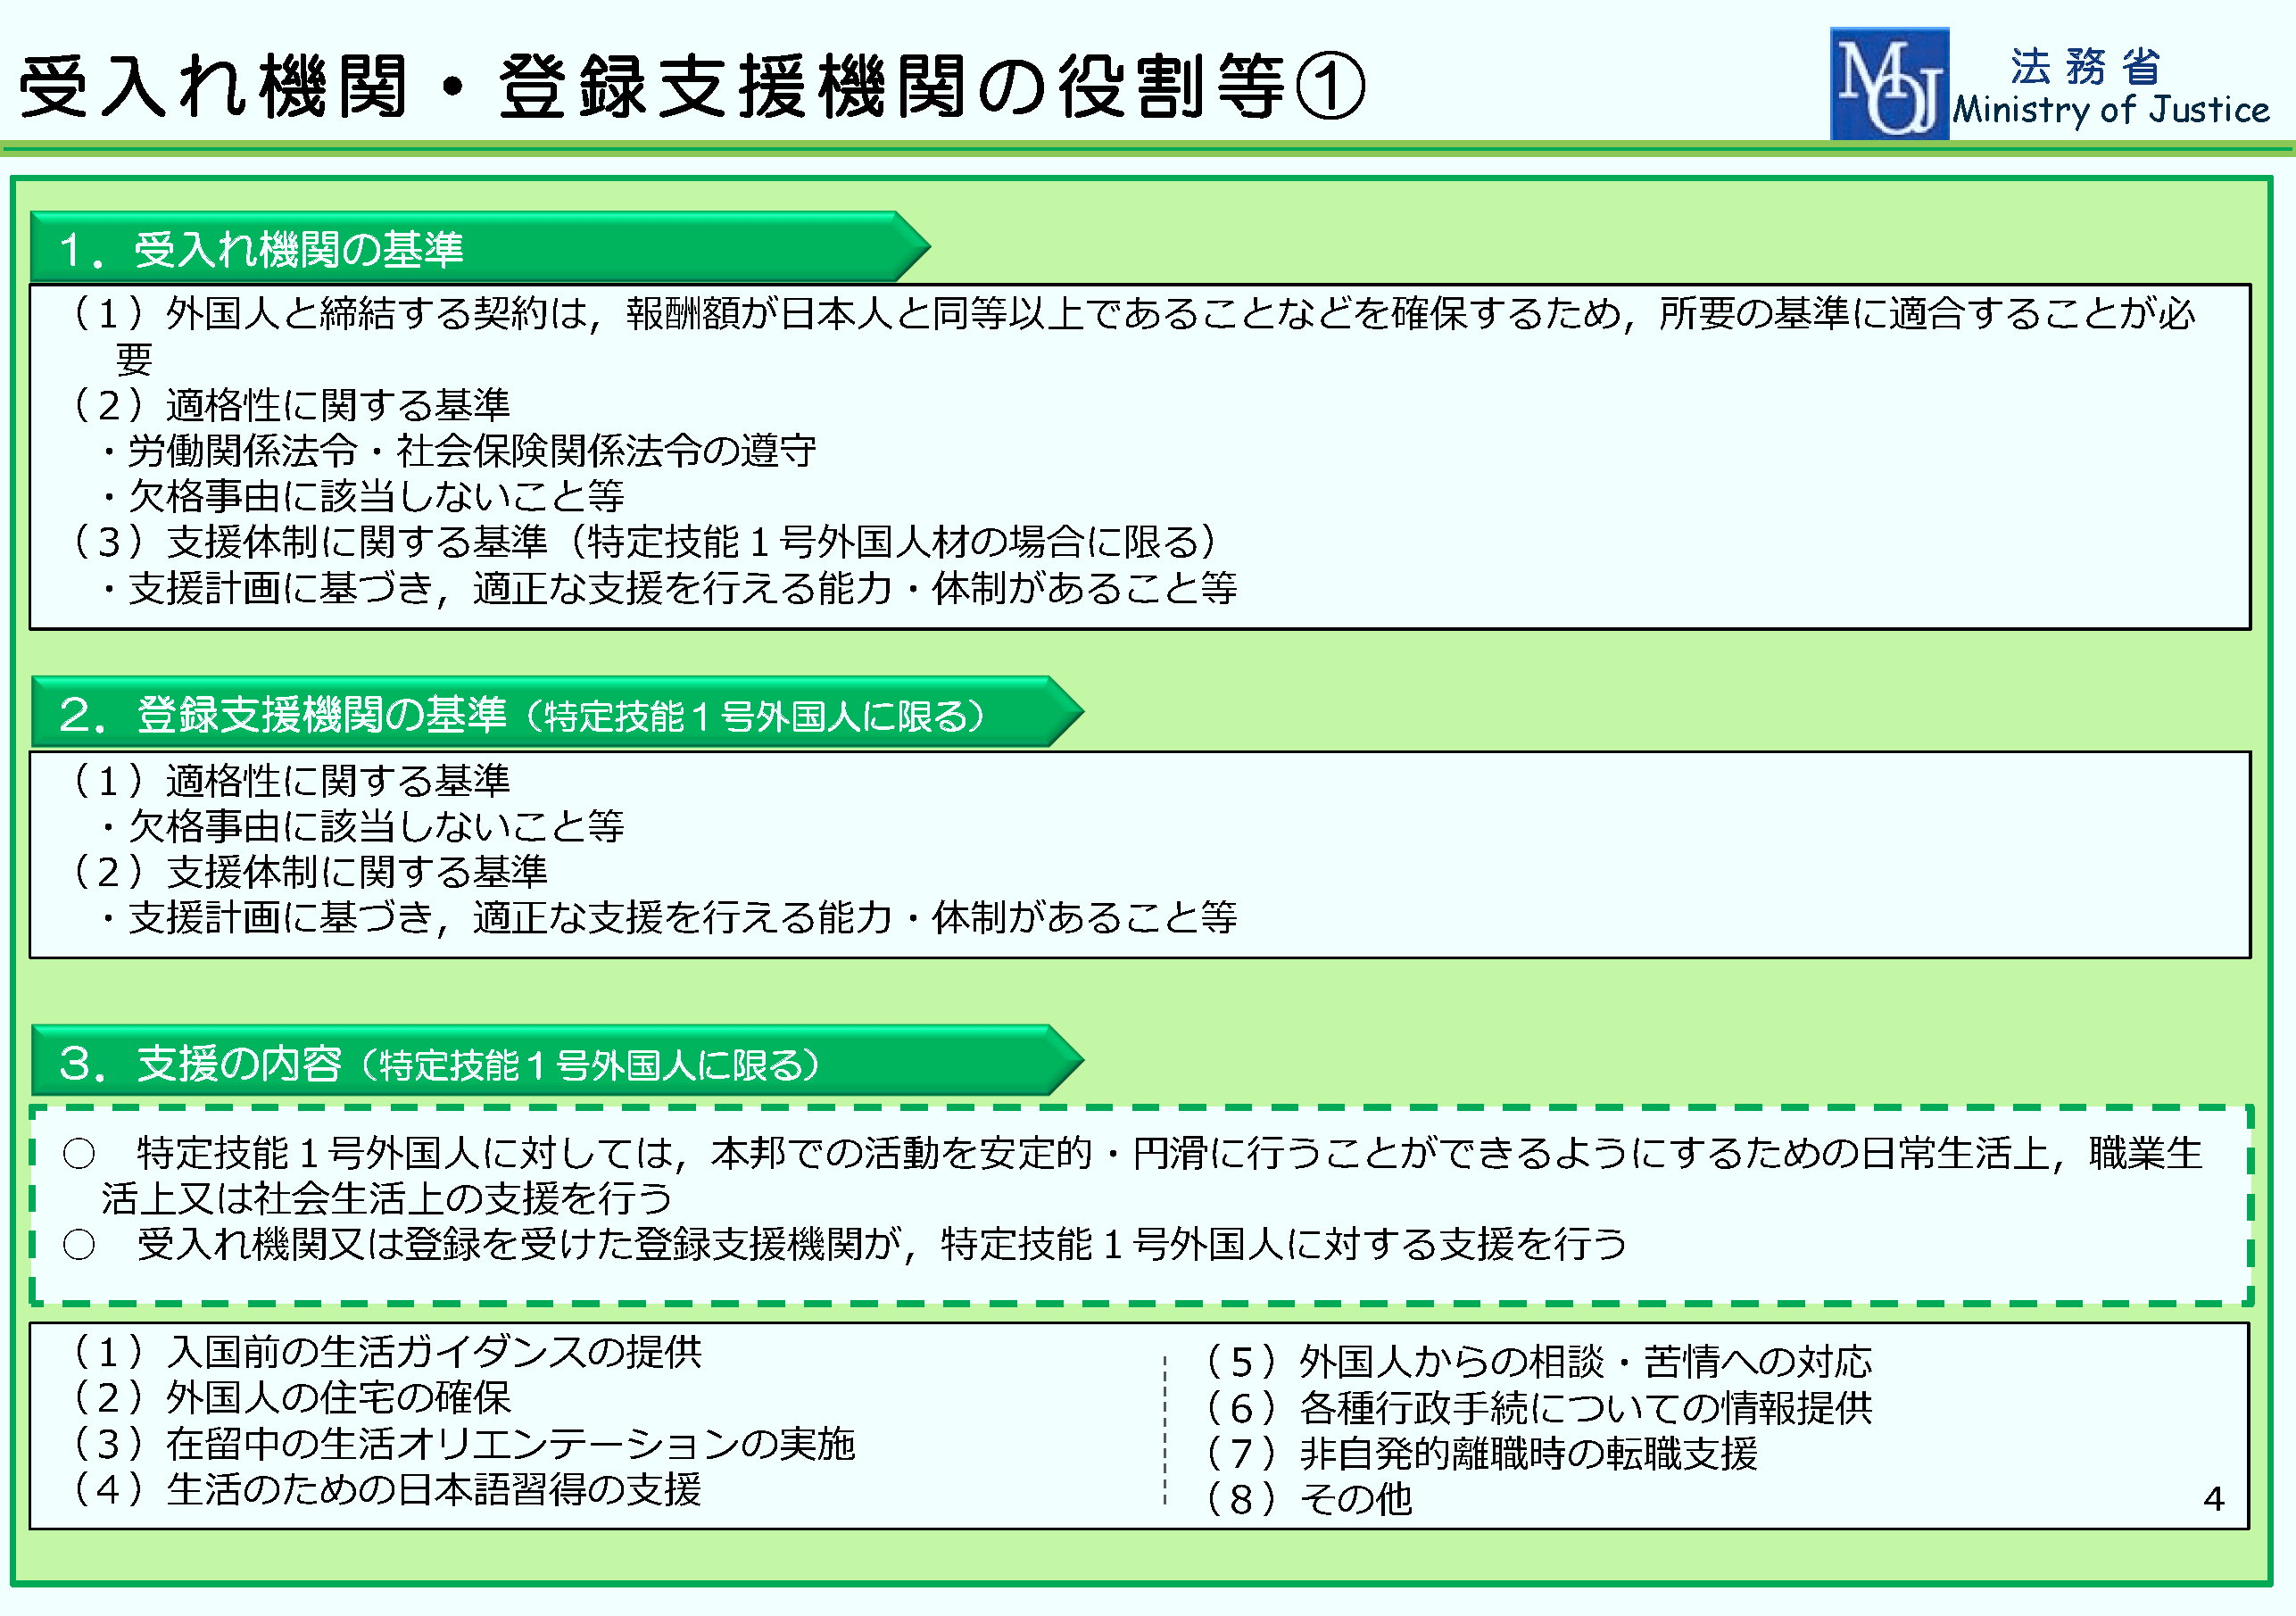 特定技能ビザ(在留資格)資料2-5